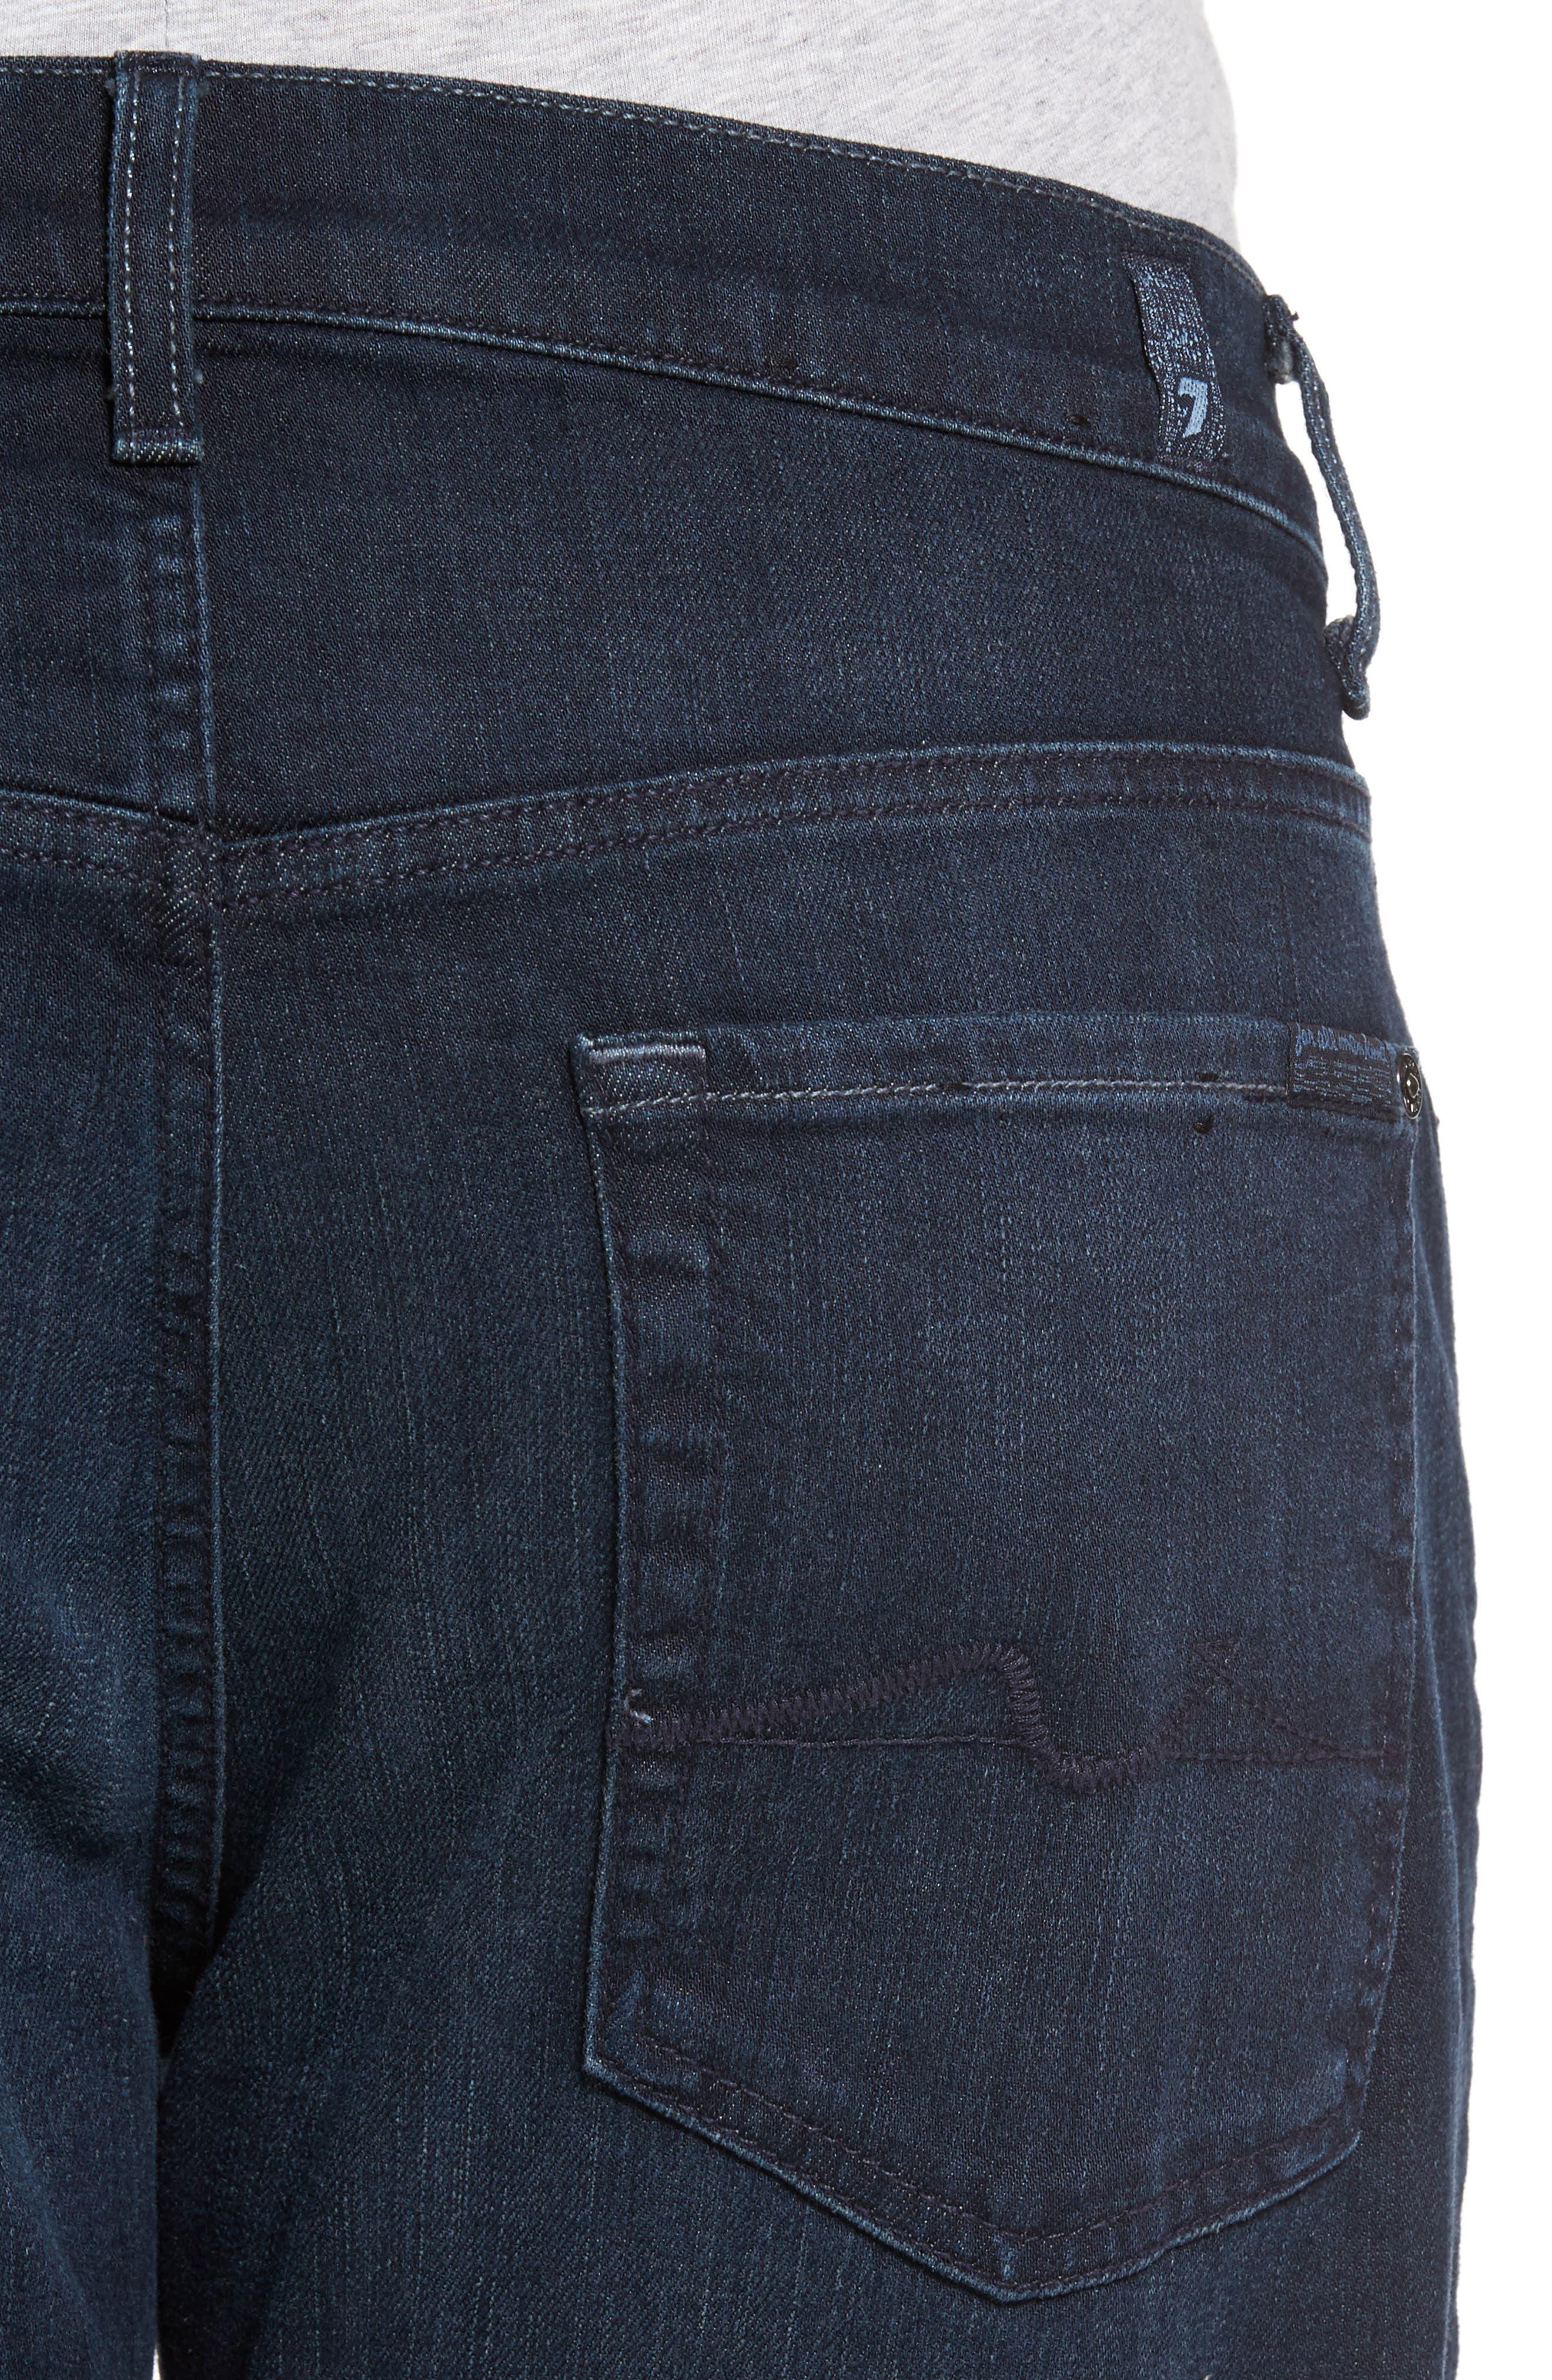 Luxe Performance - Carsen Straight Leg Jeans,                             Alternate thumbnail 4, color,                             Dark Current